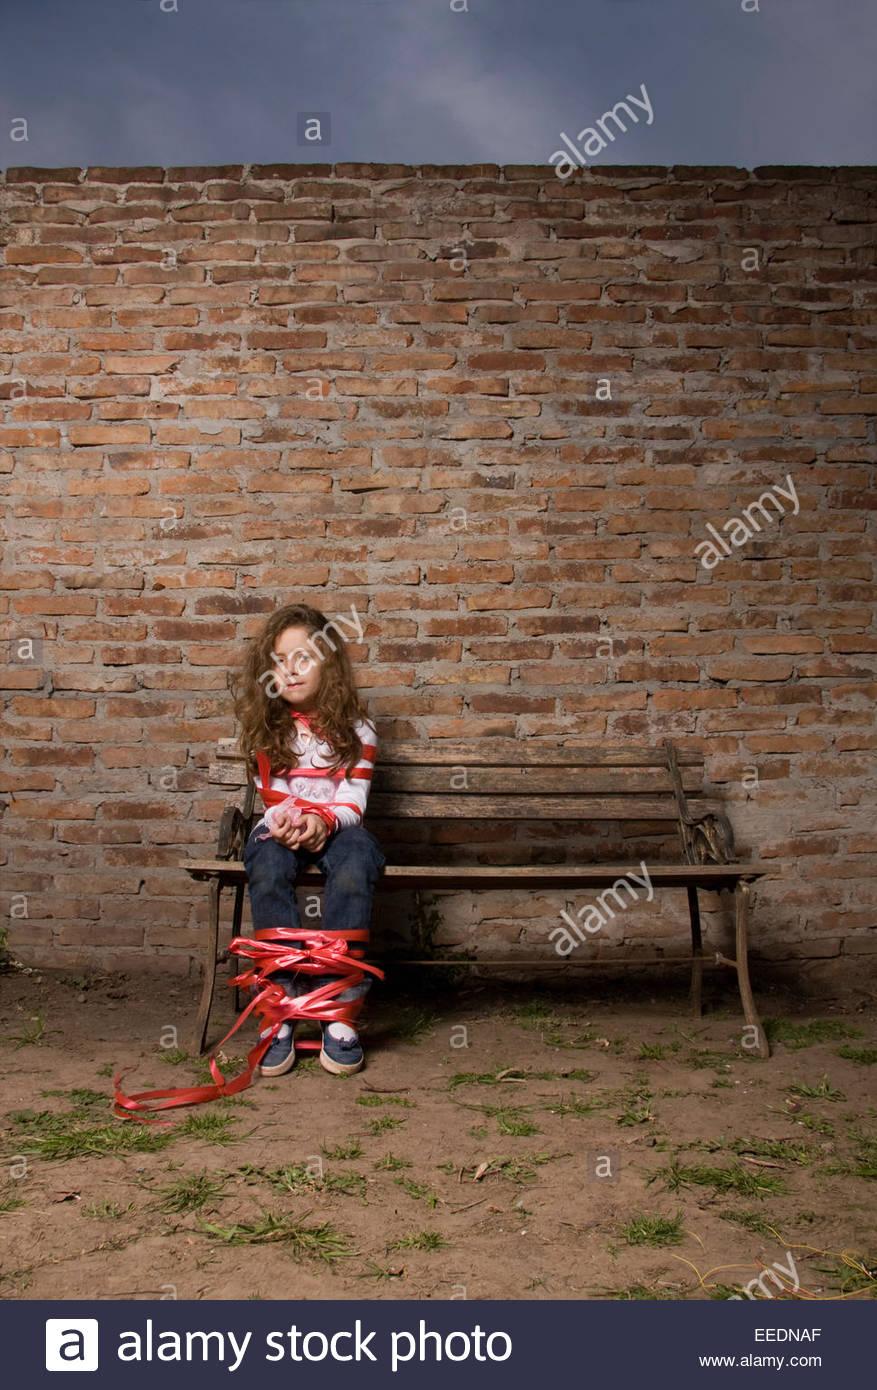 littlegirl tied up Little Girls Tied Up on Park Bench Stock Photo